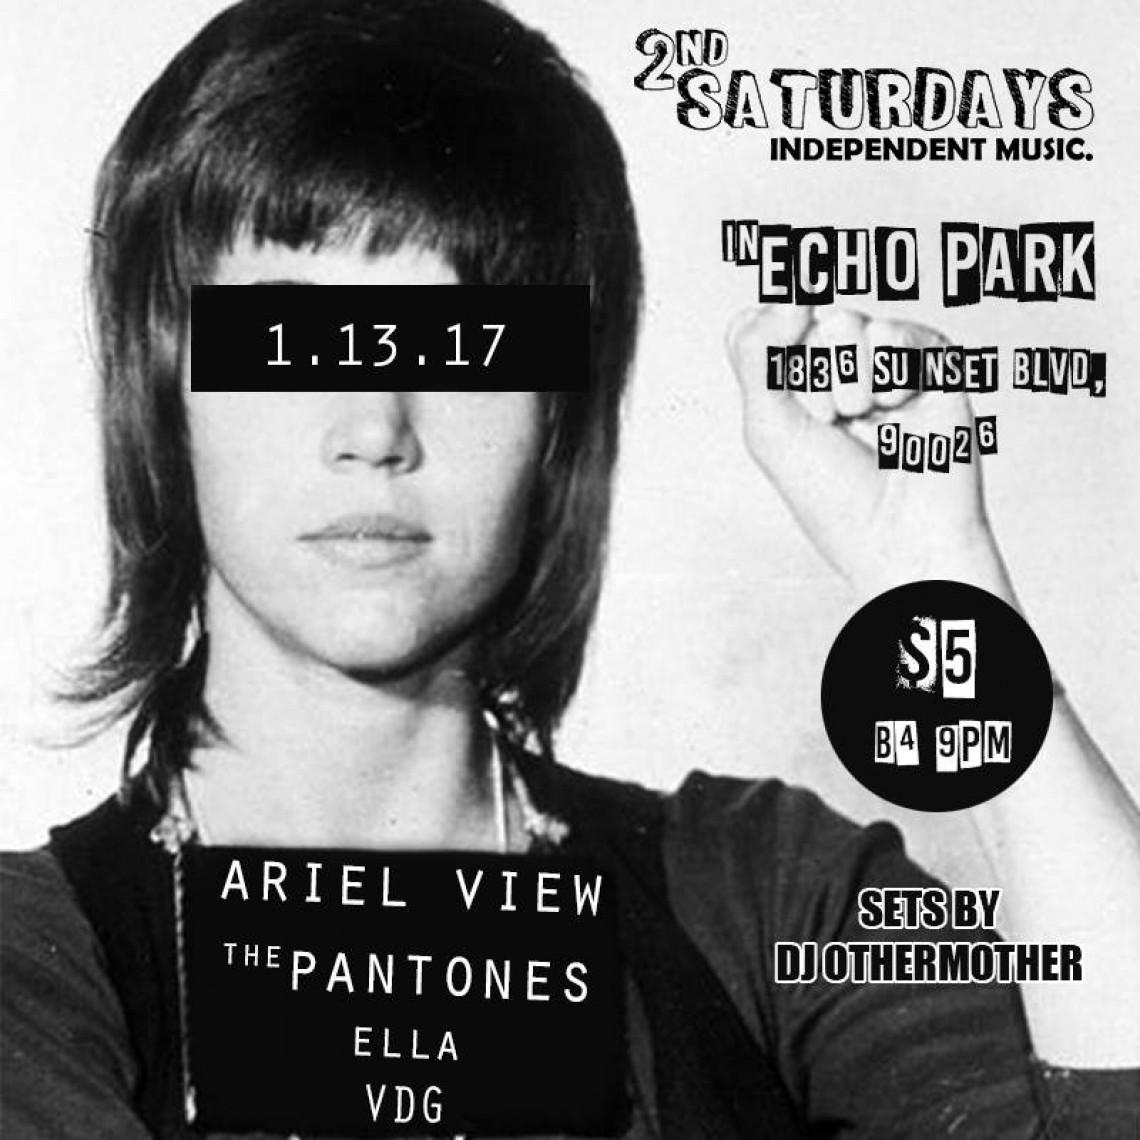 2nd Saturdays: Ariel View, The Pantones, Ella, VDG